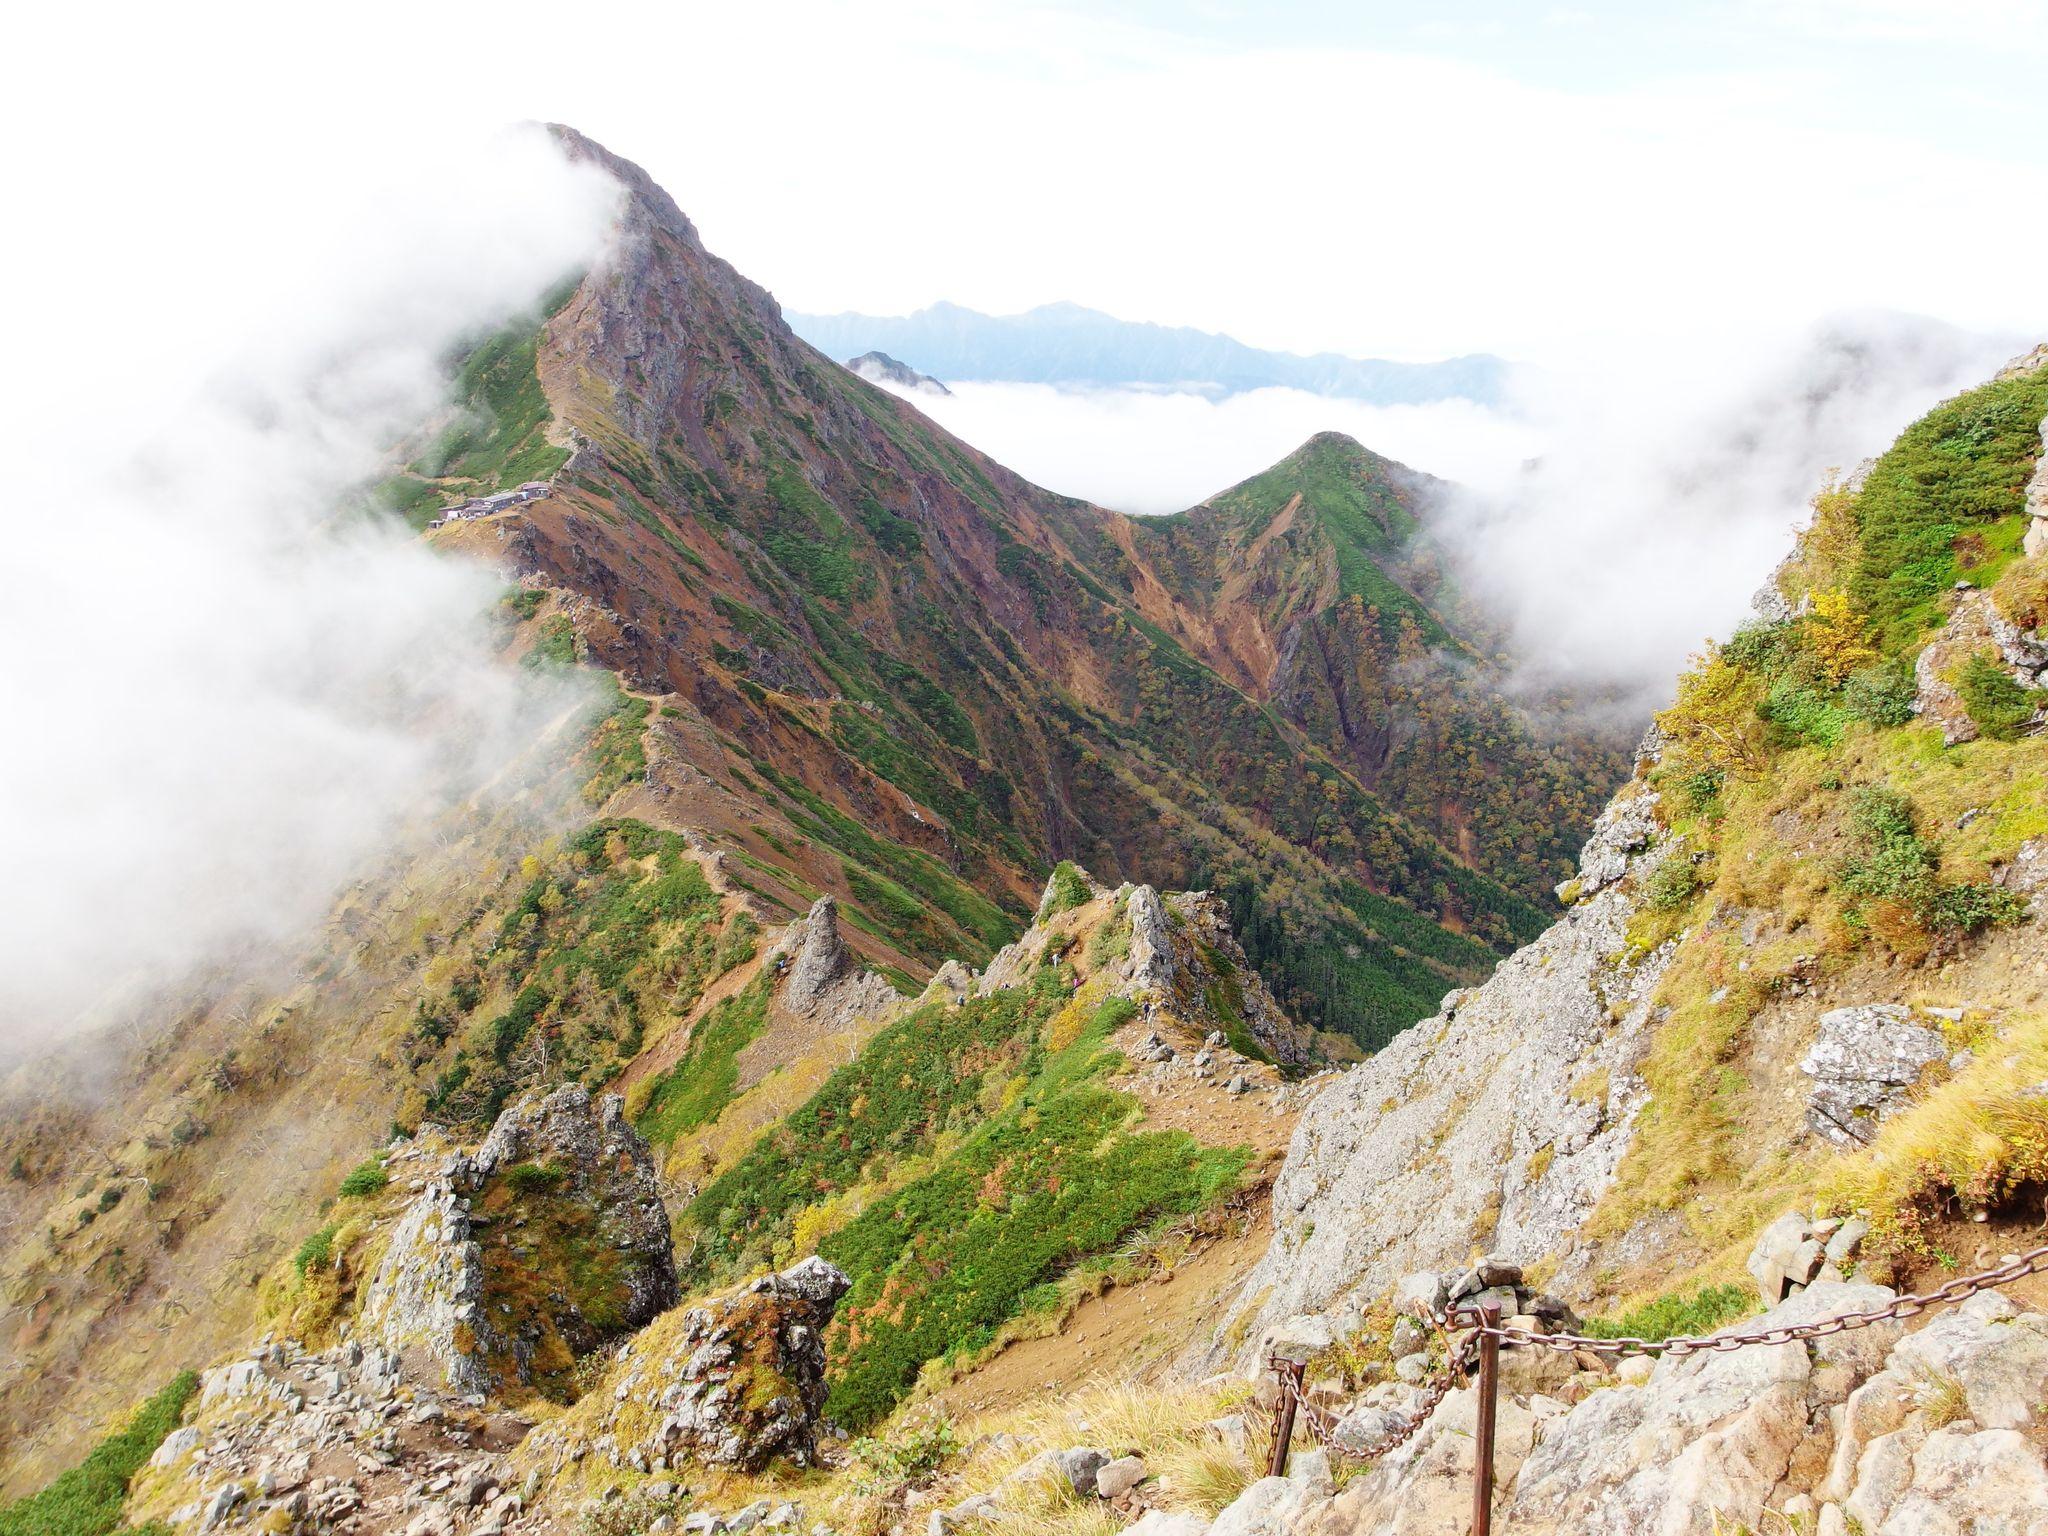 2021.7.17-18 山の講習会中級編《硫黄岳~赤岳》(S7)